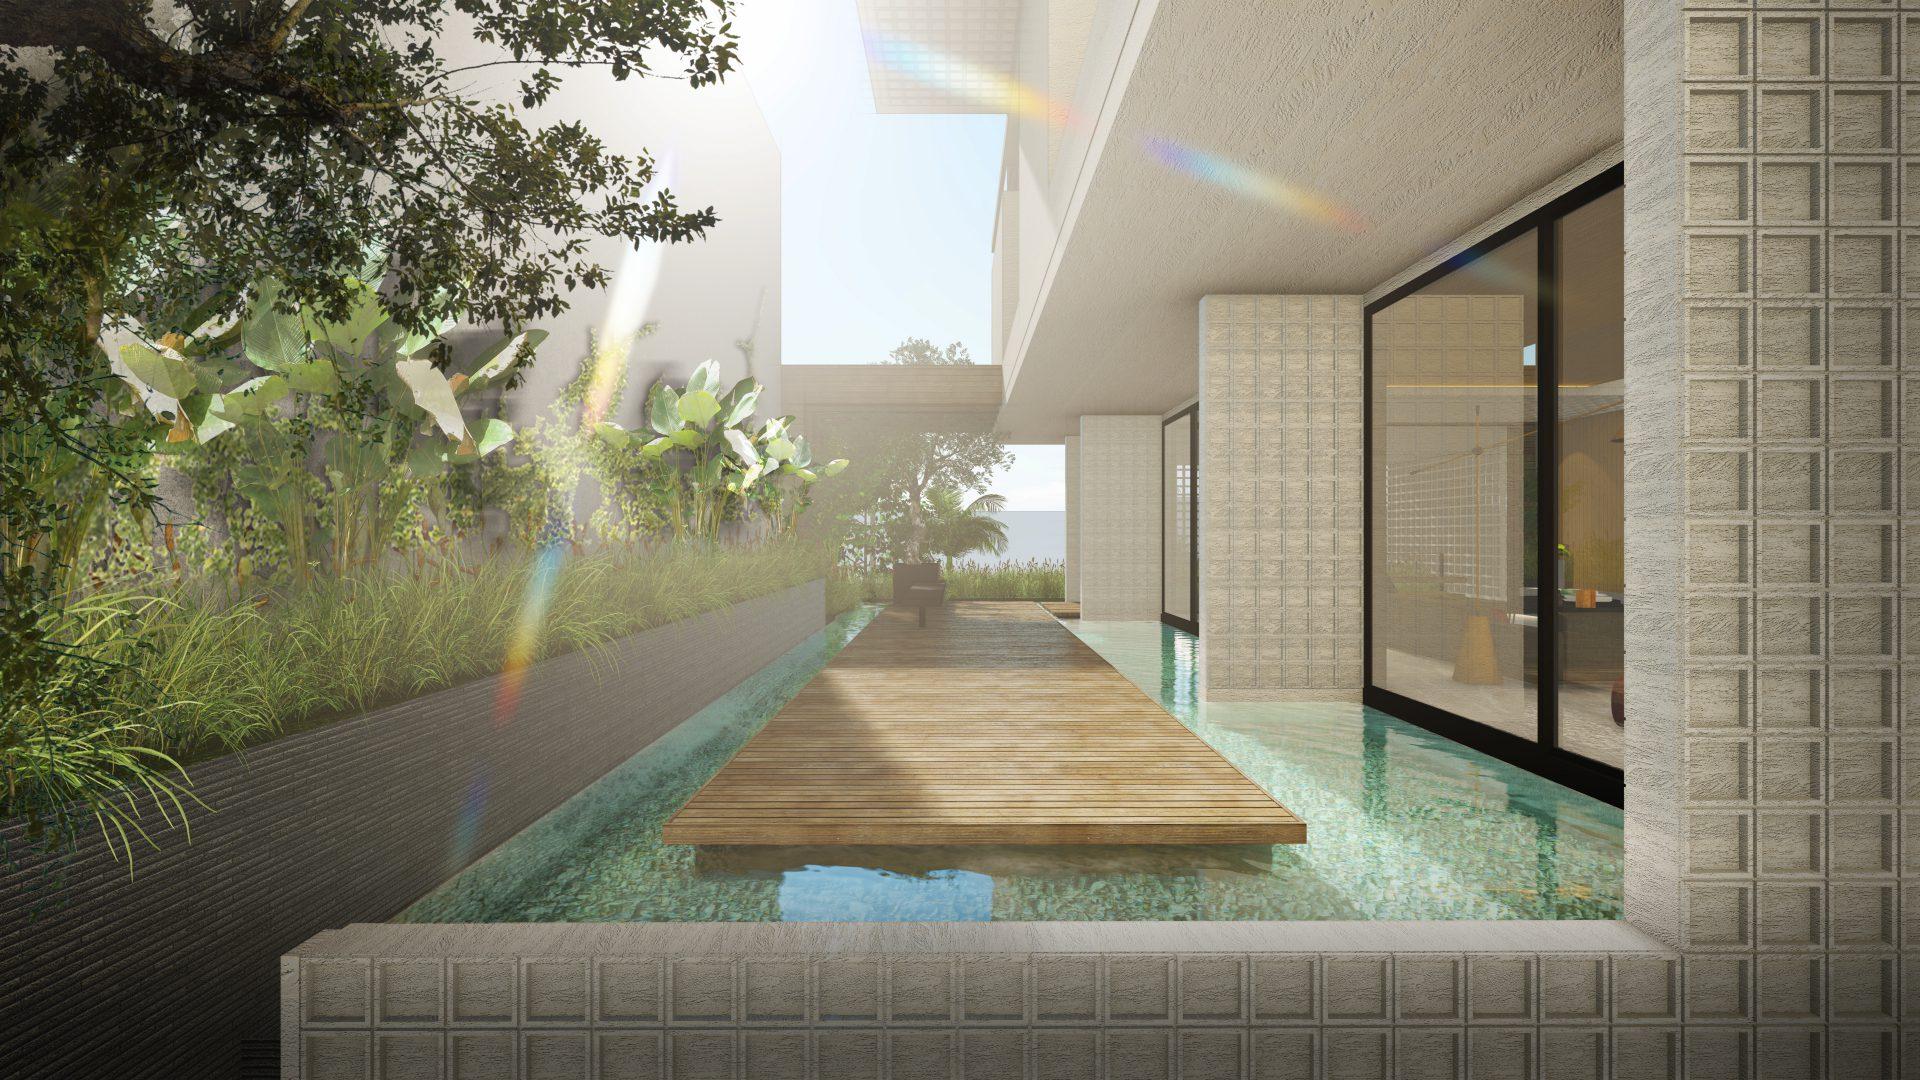 MAIN FLOWER HOUSE - Image 3